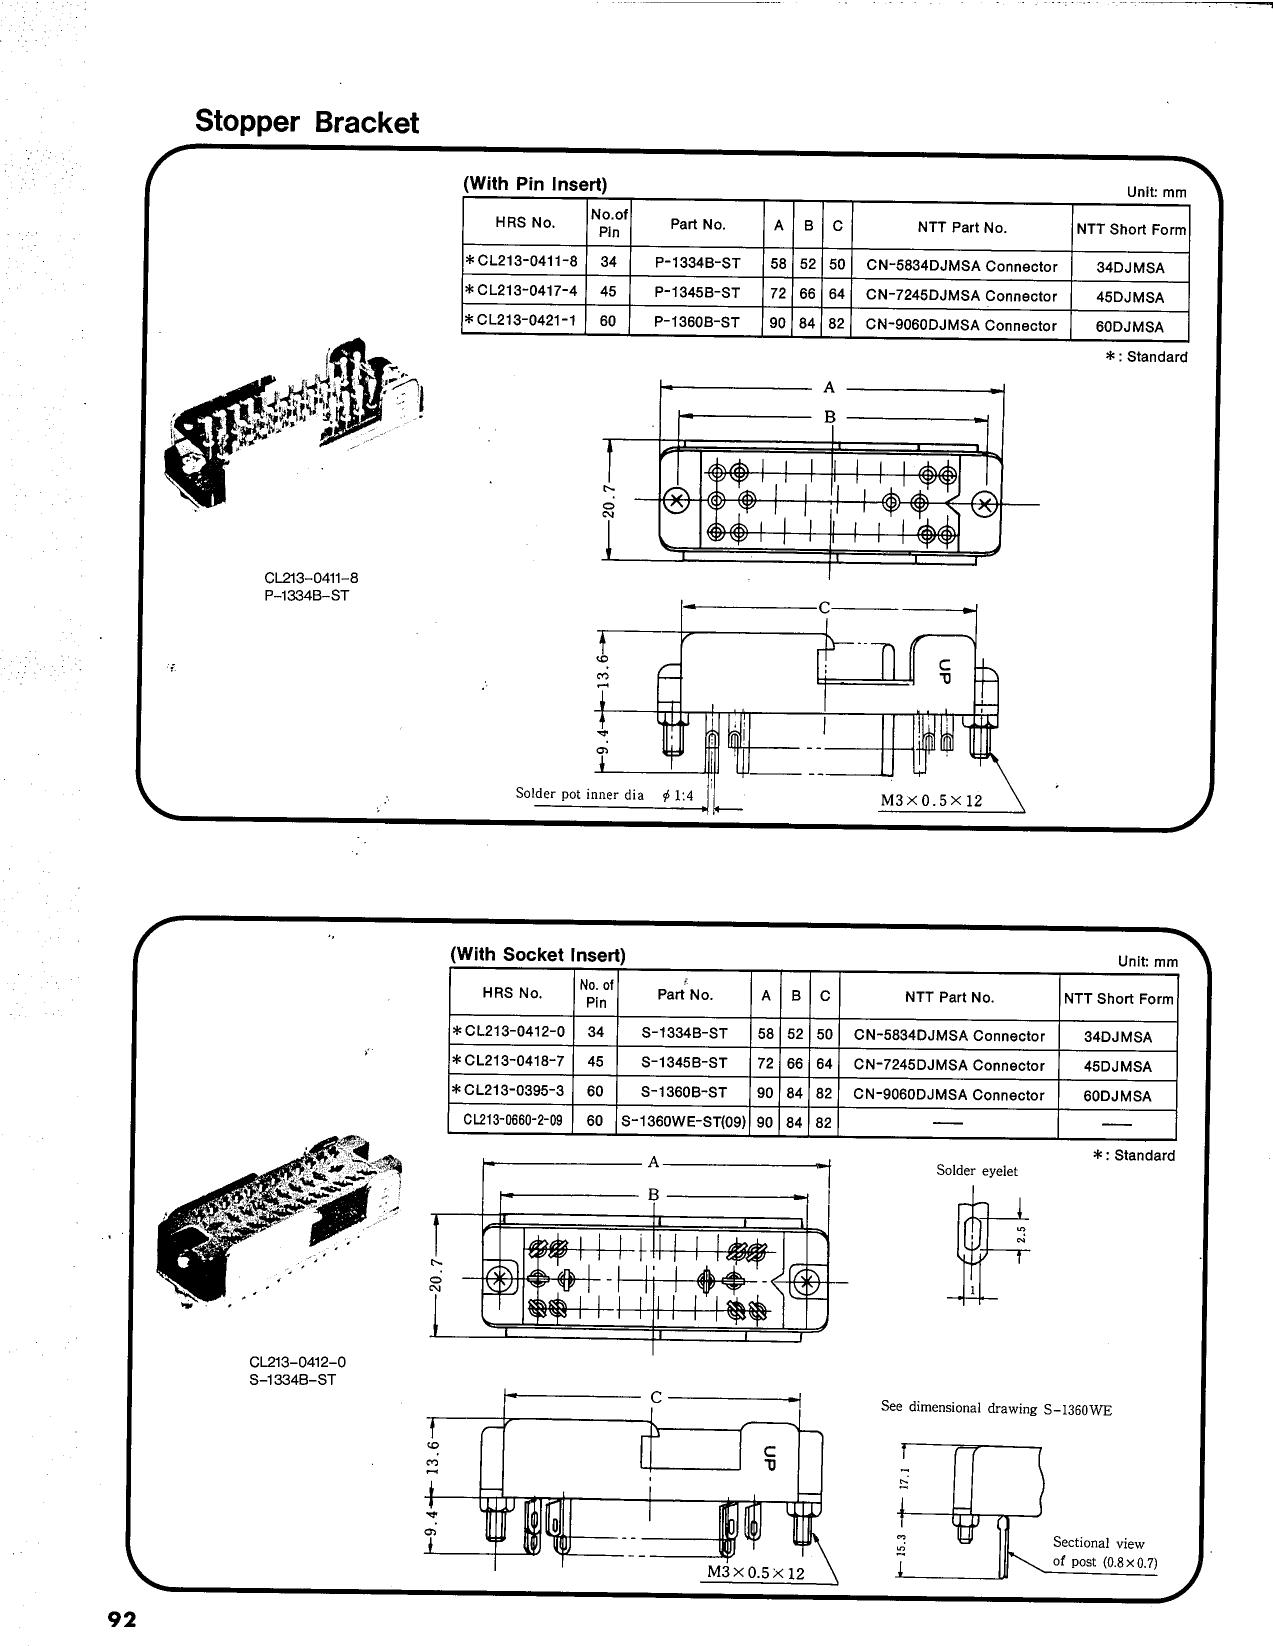 P-1312W-SB arduino